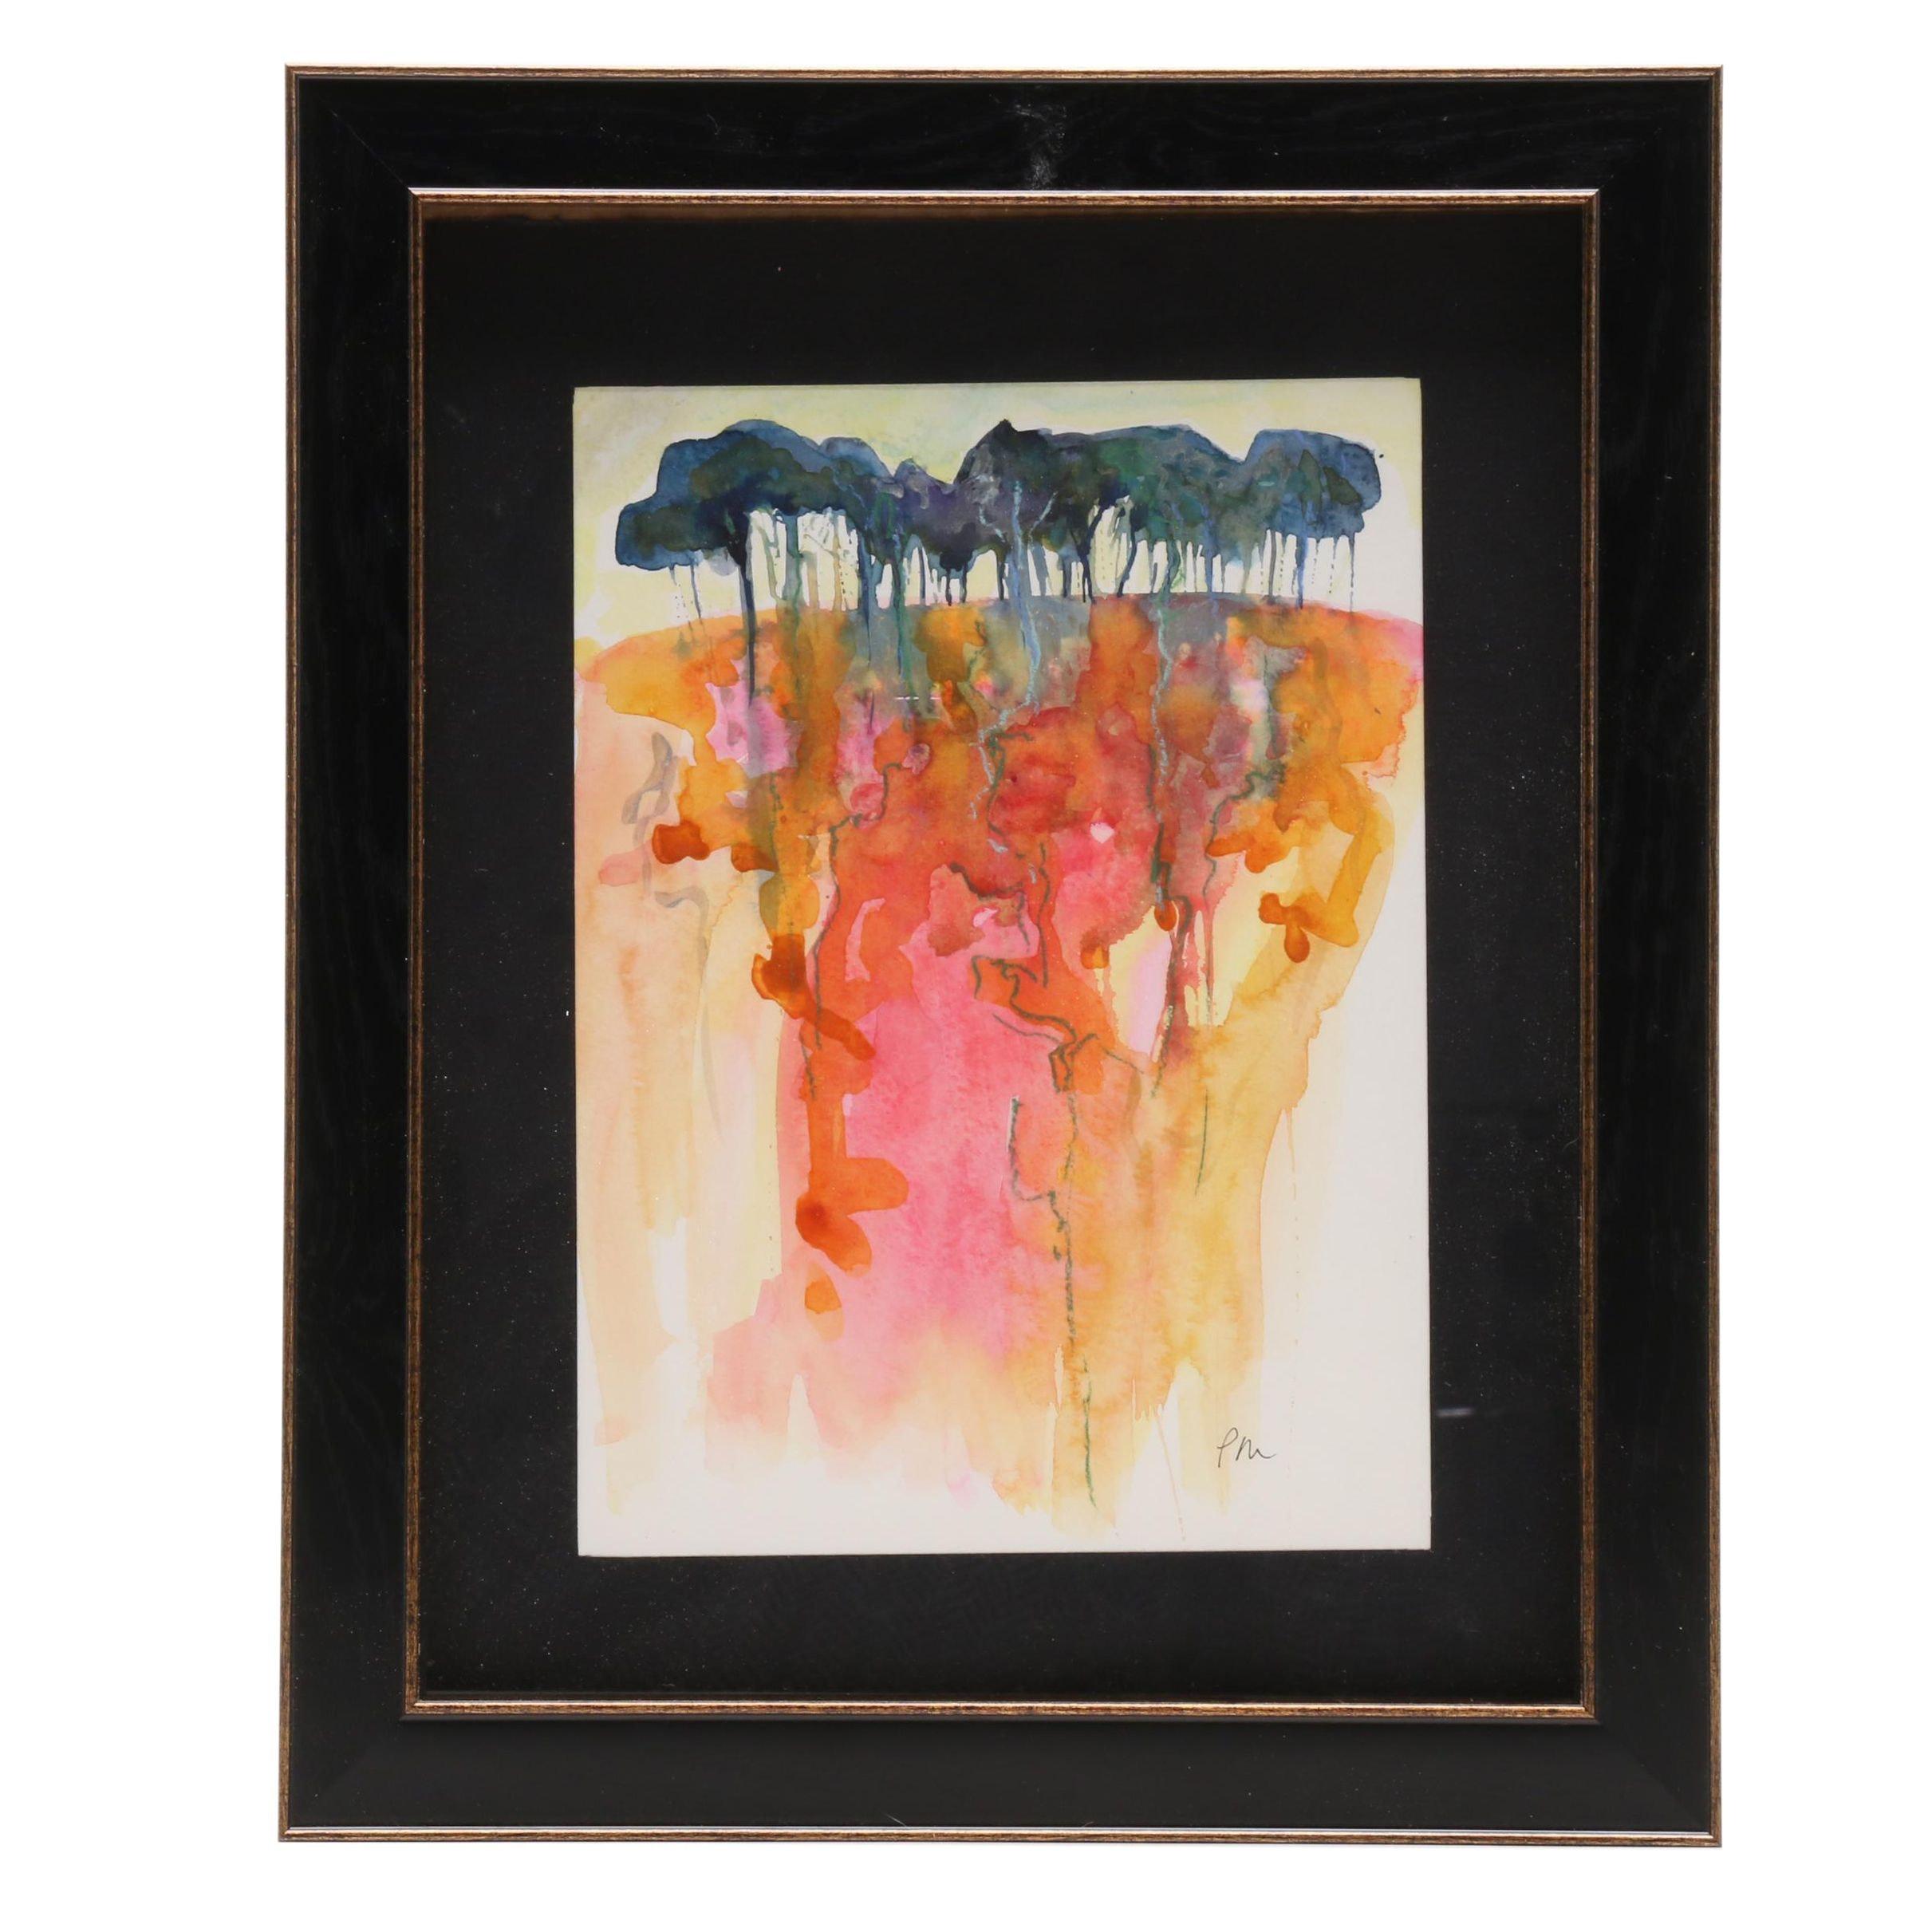 Patricia MacDonald Watercolor Landscape Painting